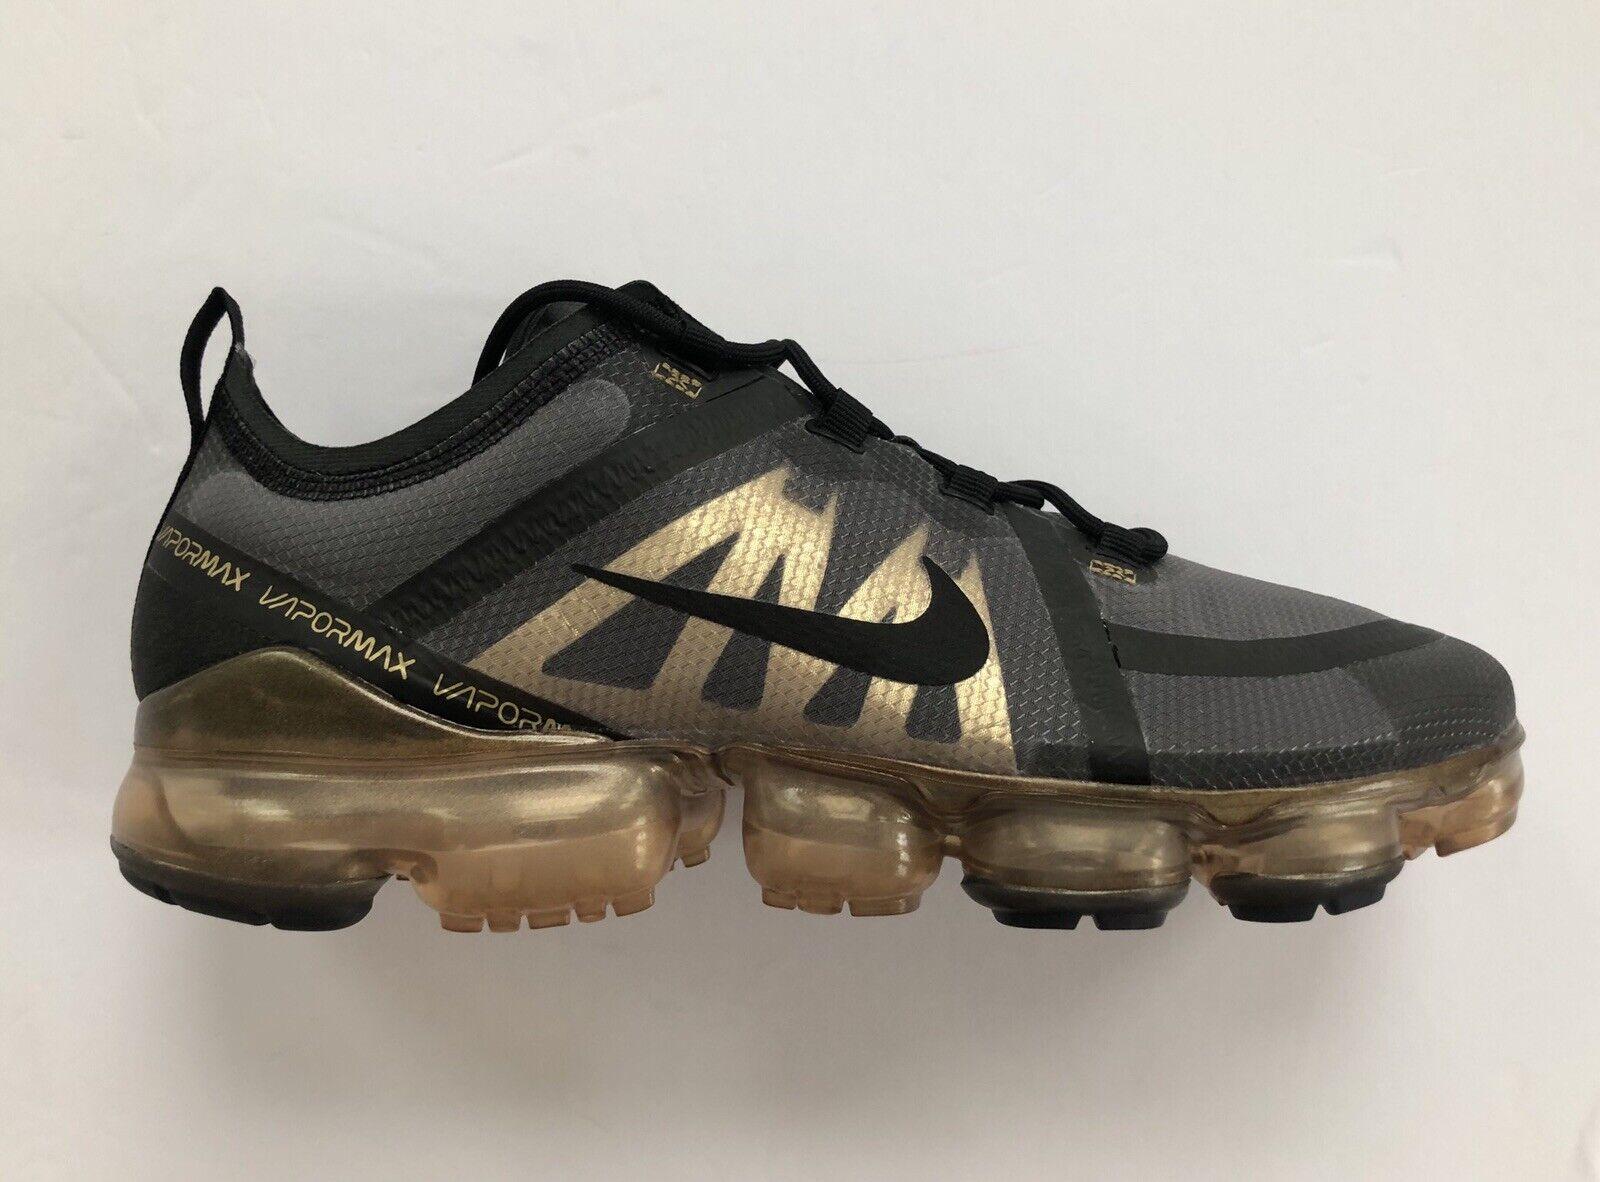 Nike Air Vapormax 2019 Black Metallic gold shoes UCF AR6631-002 Size 13